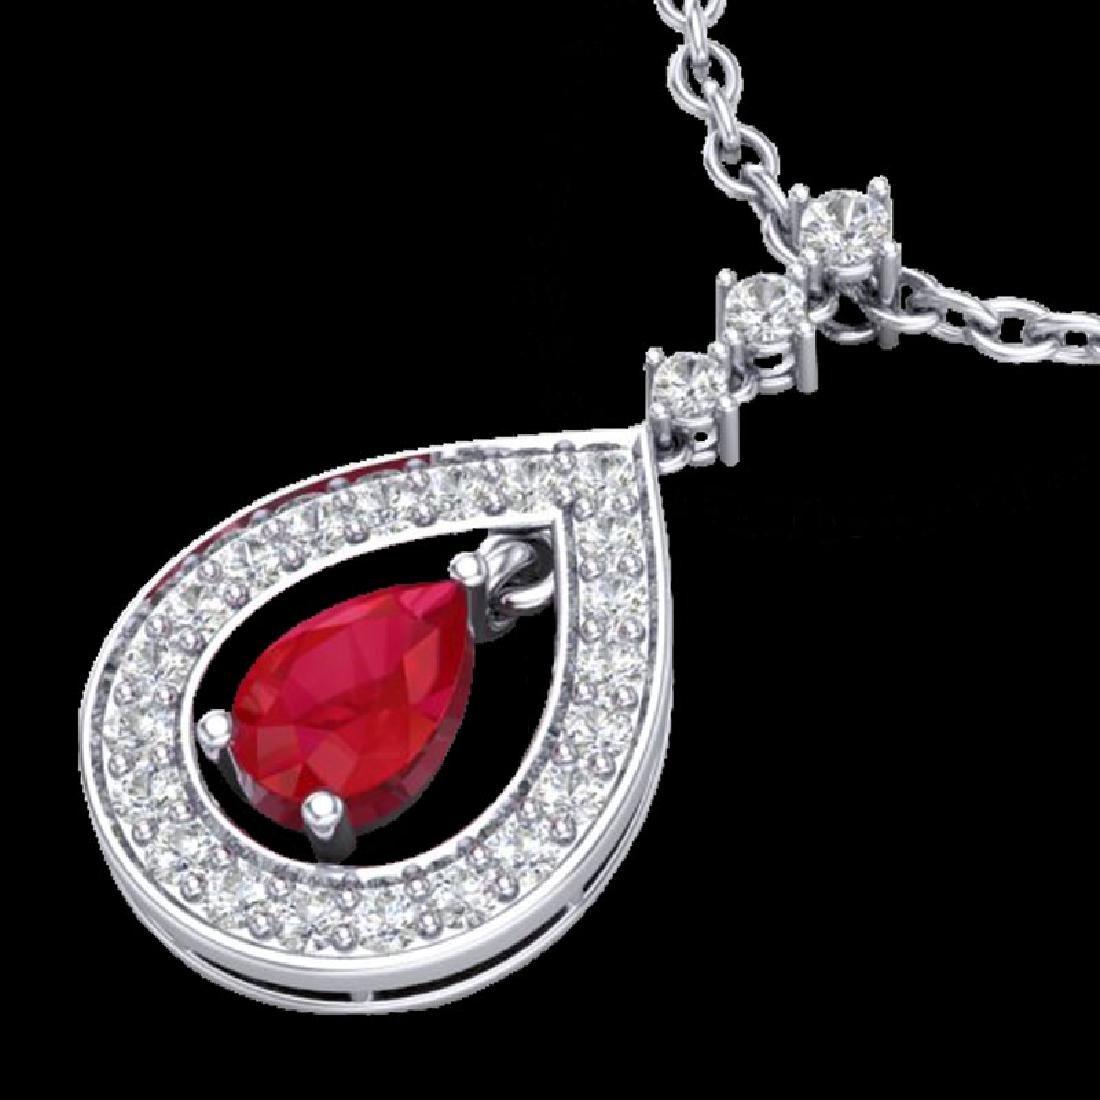 1.15 CTW Ruby & Micro Pave VS/SI Diamond Necklace